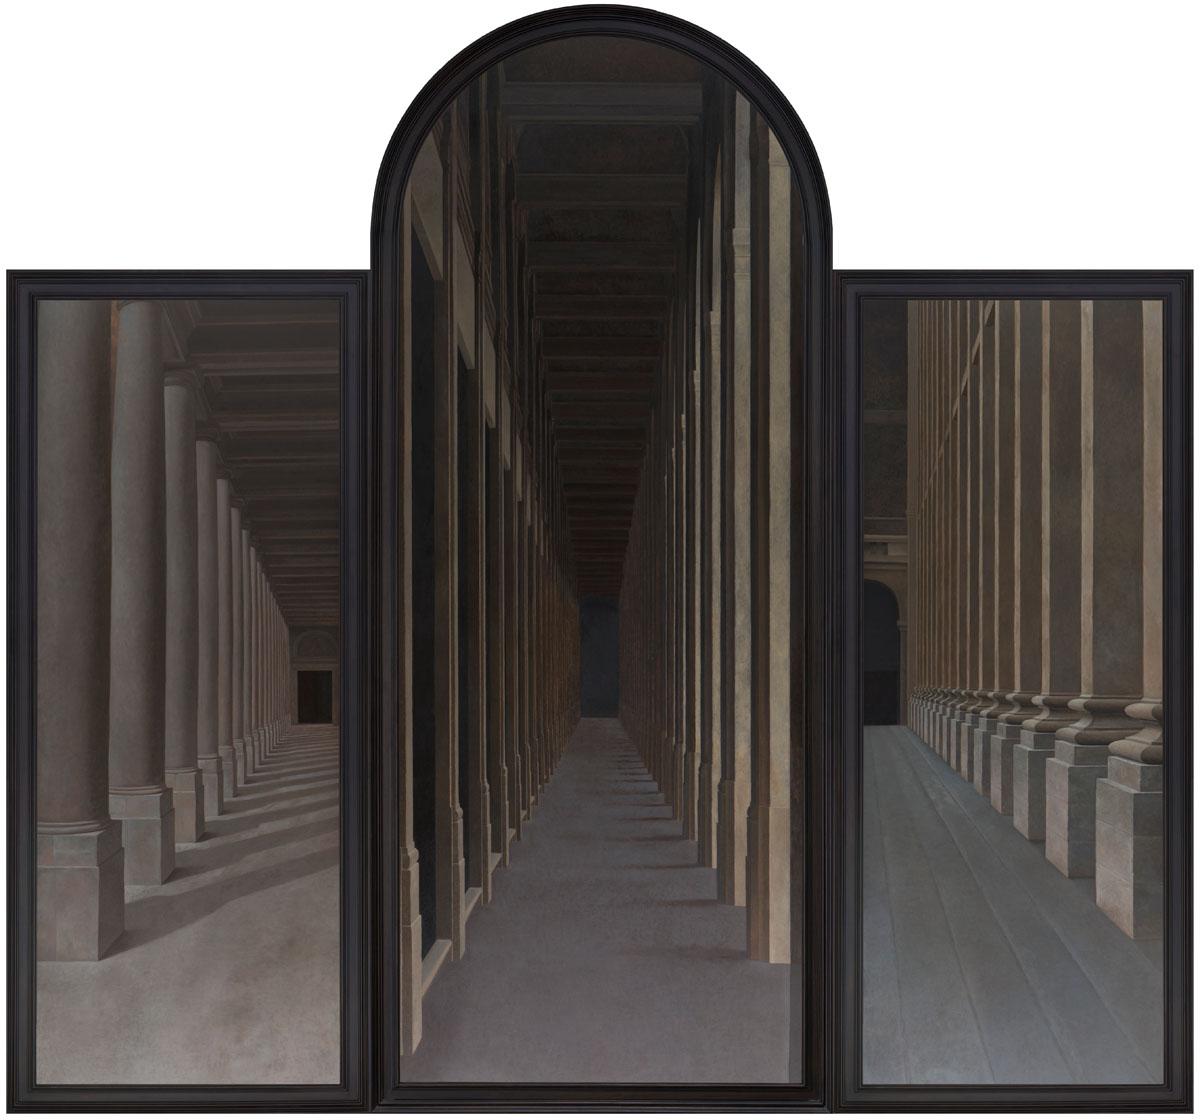 The Silent Gateway